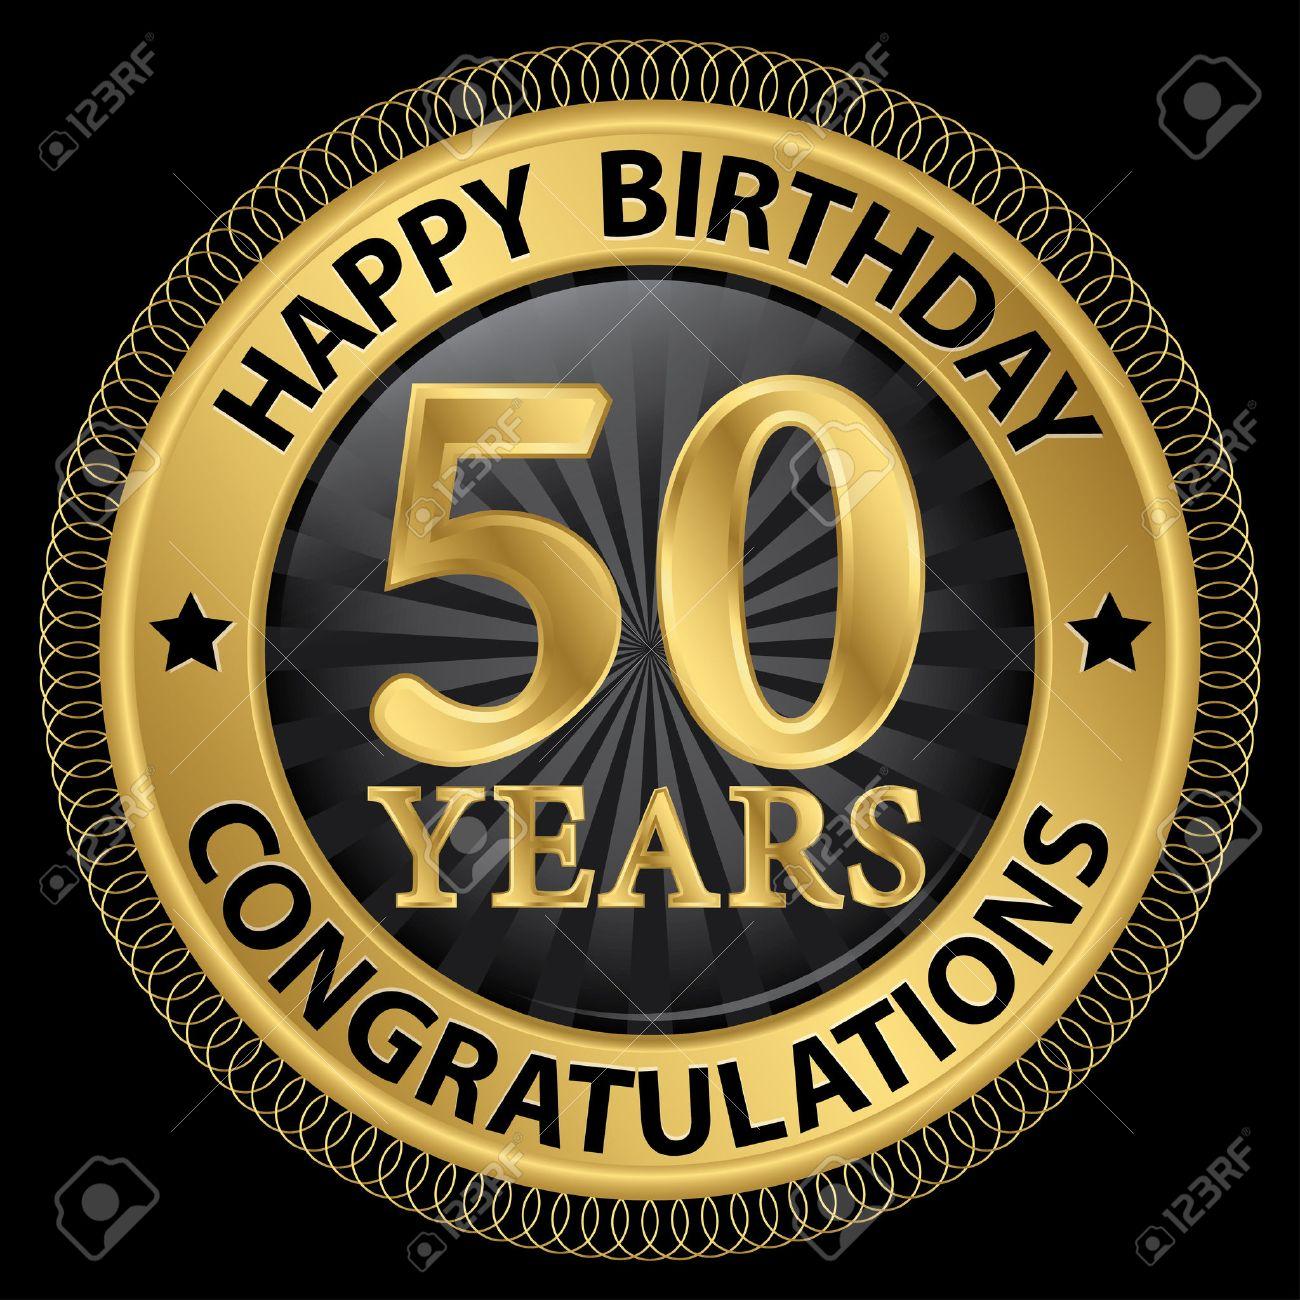 50 Years Happy Birthday Congratulations Gold Label Illustration Stock Vector